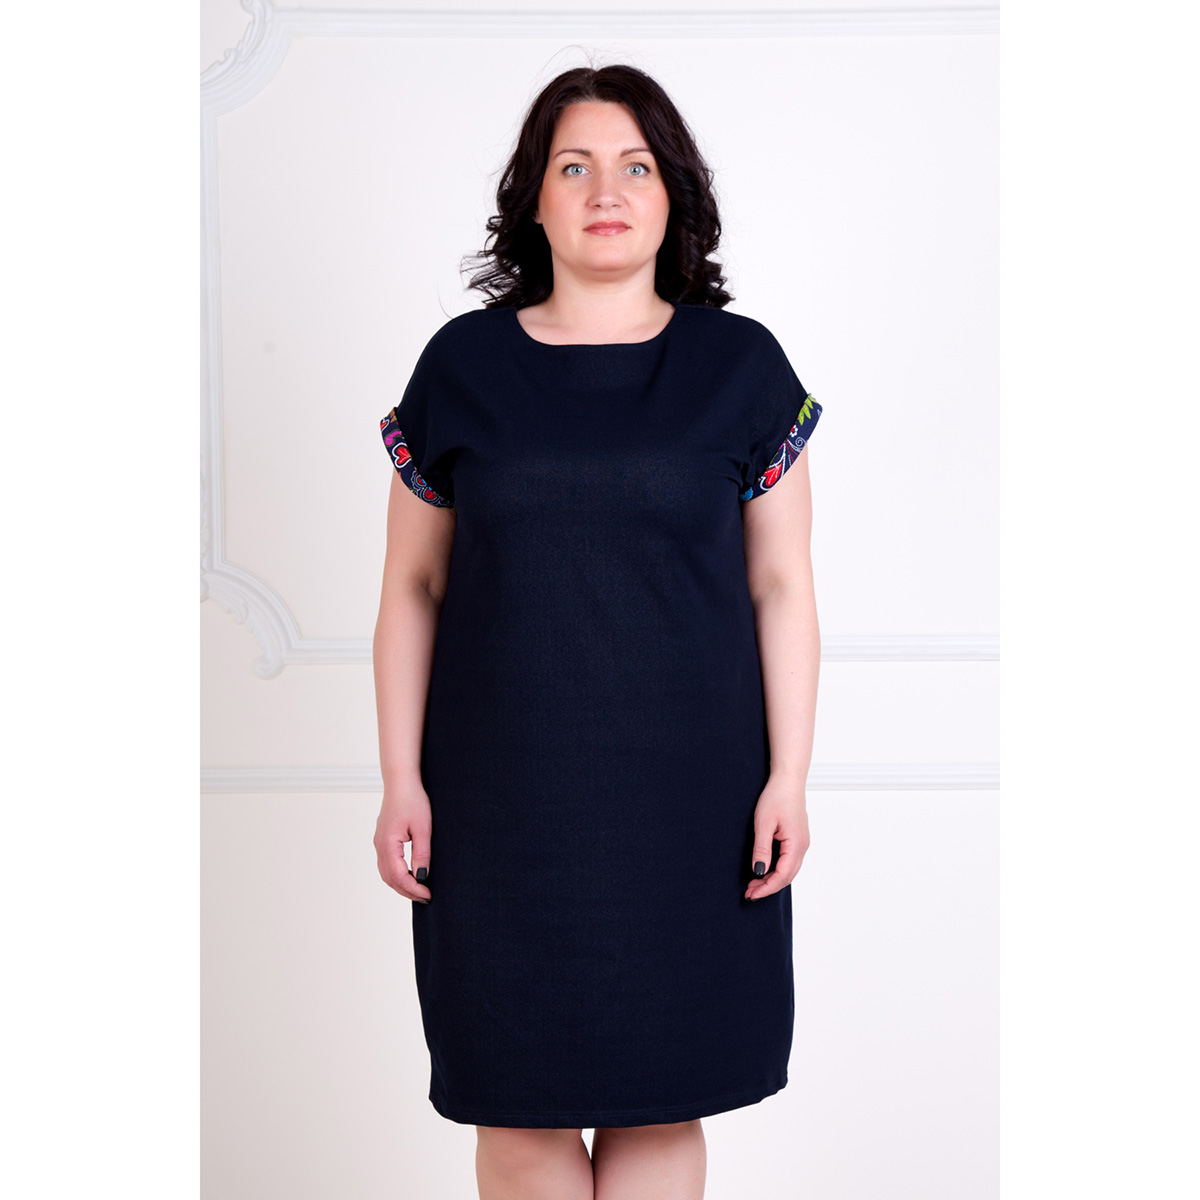 Жен. платье Алекса р. 58Платья, туники<br>Обхват груди:116 см<br>Обхват талии:97 см<br>Обхват бедер:124 см<br>Длина по спинке:97.5 см<br>Рост:167 см<br><br>Тип: Жен. платье<br>Размер: 58<br>Материал: Футер